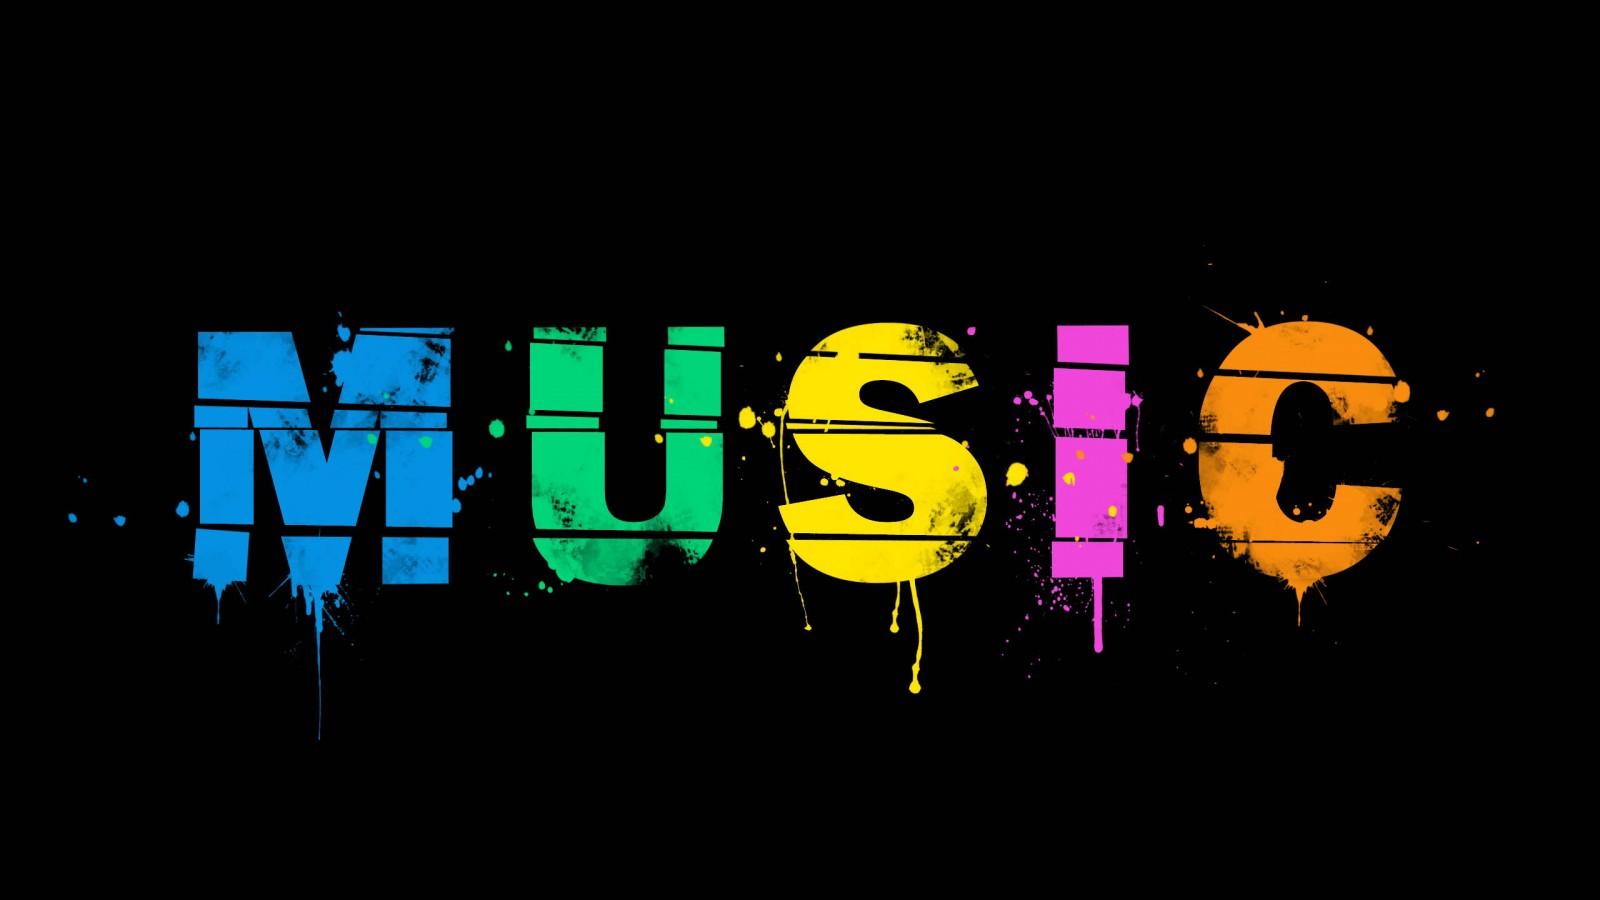 Music Splash HD Wallpaper